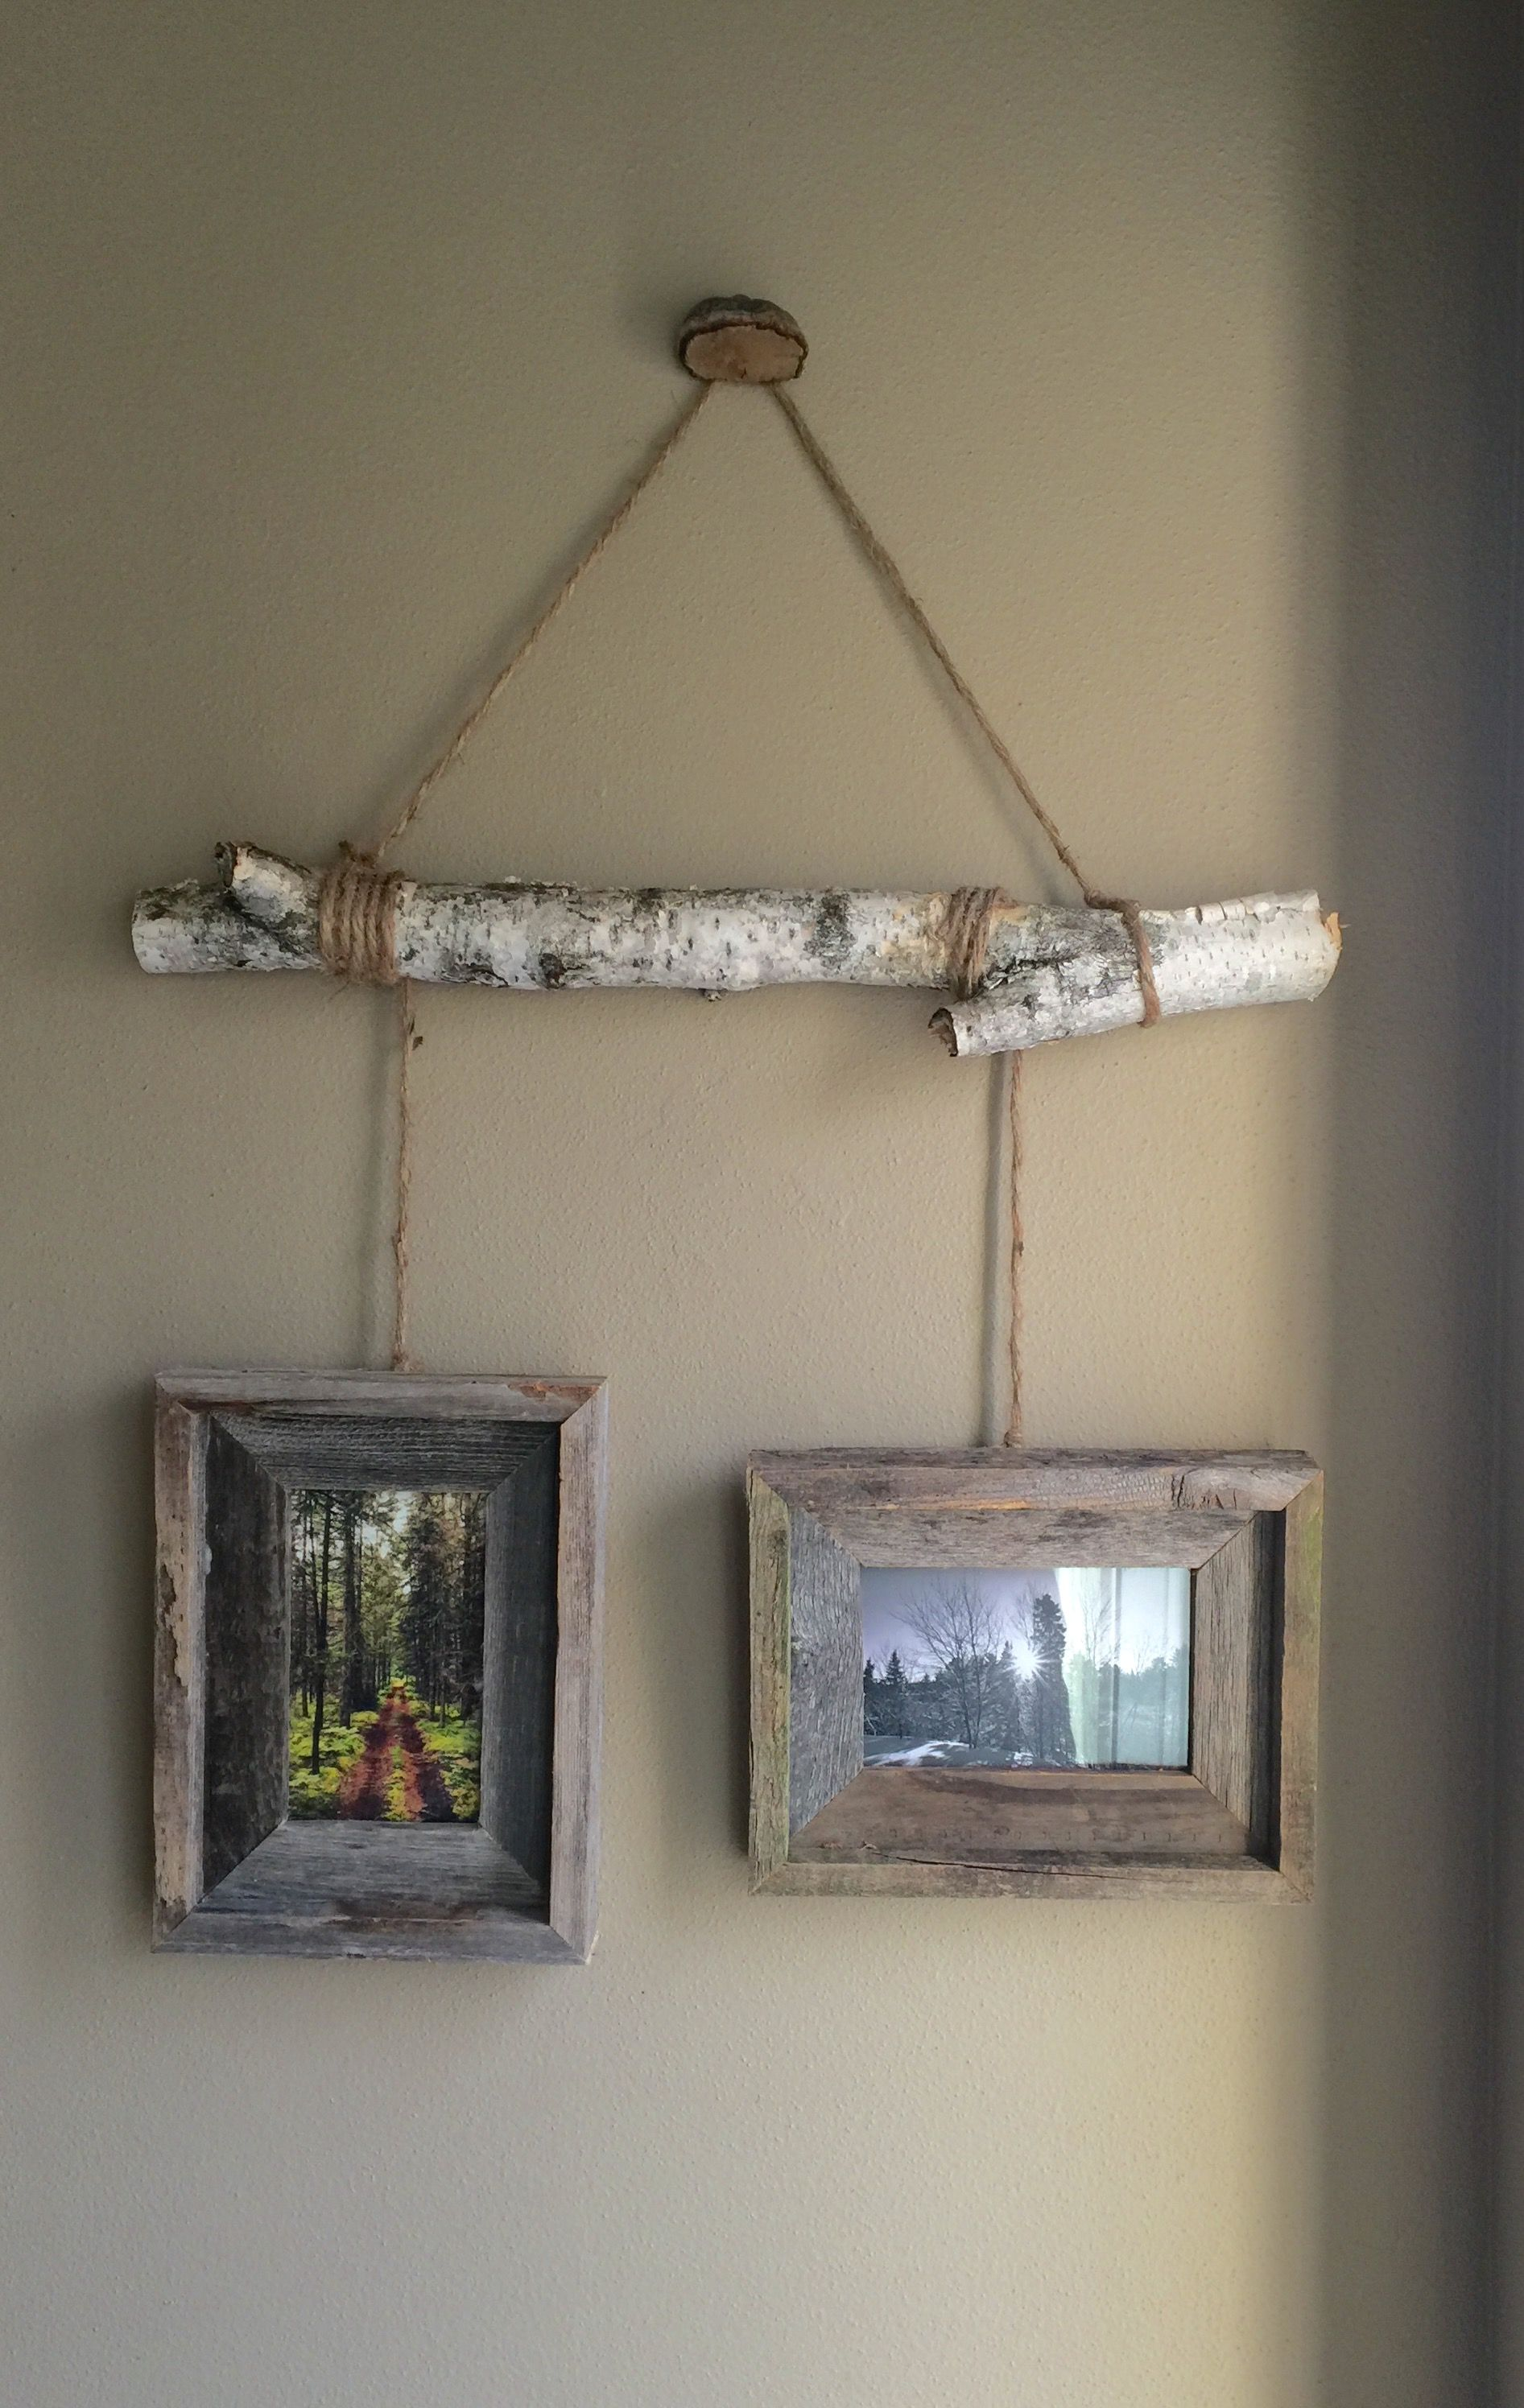 Birch Tree Limb picture hanger by Cynthia De Vor  Birch